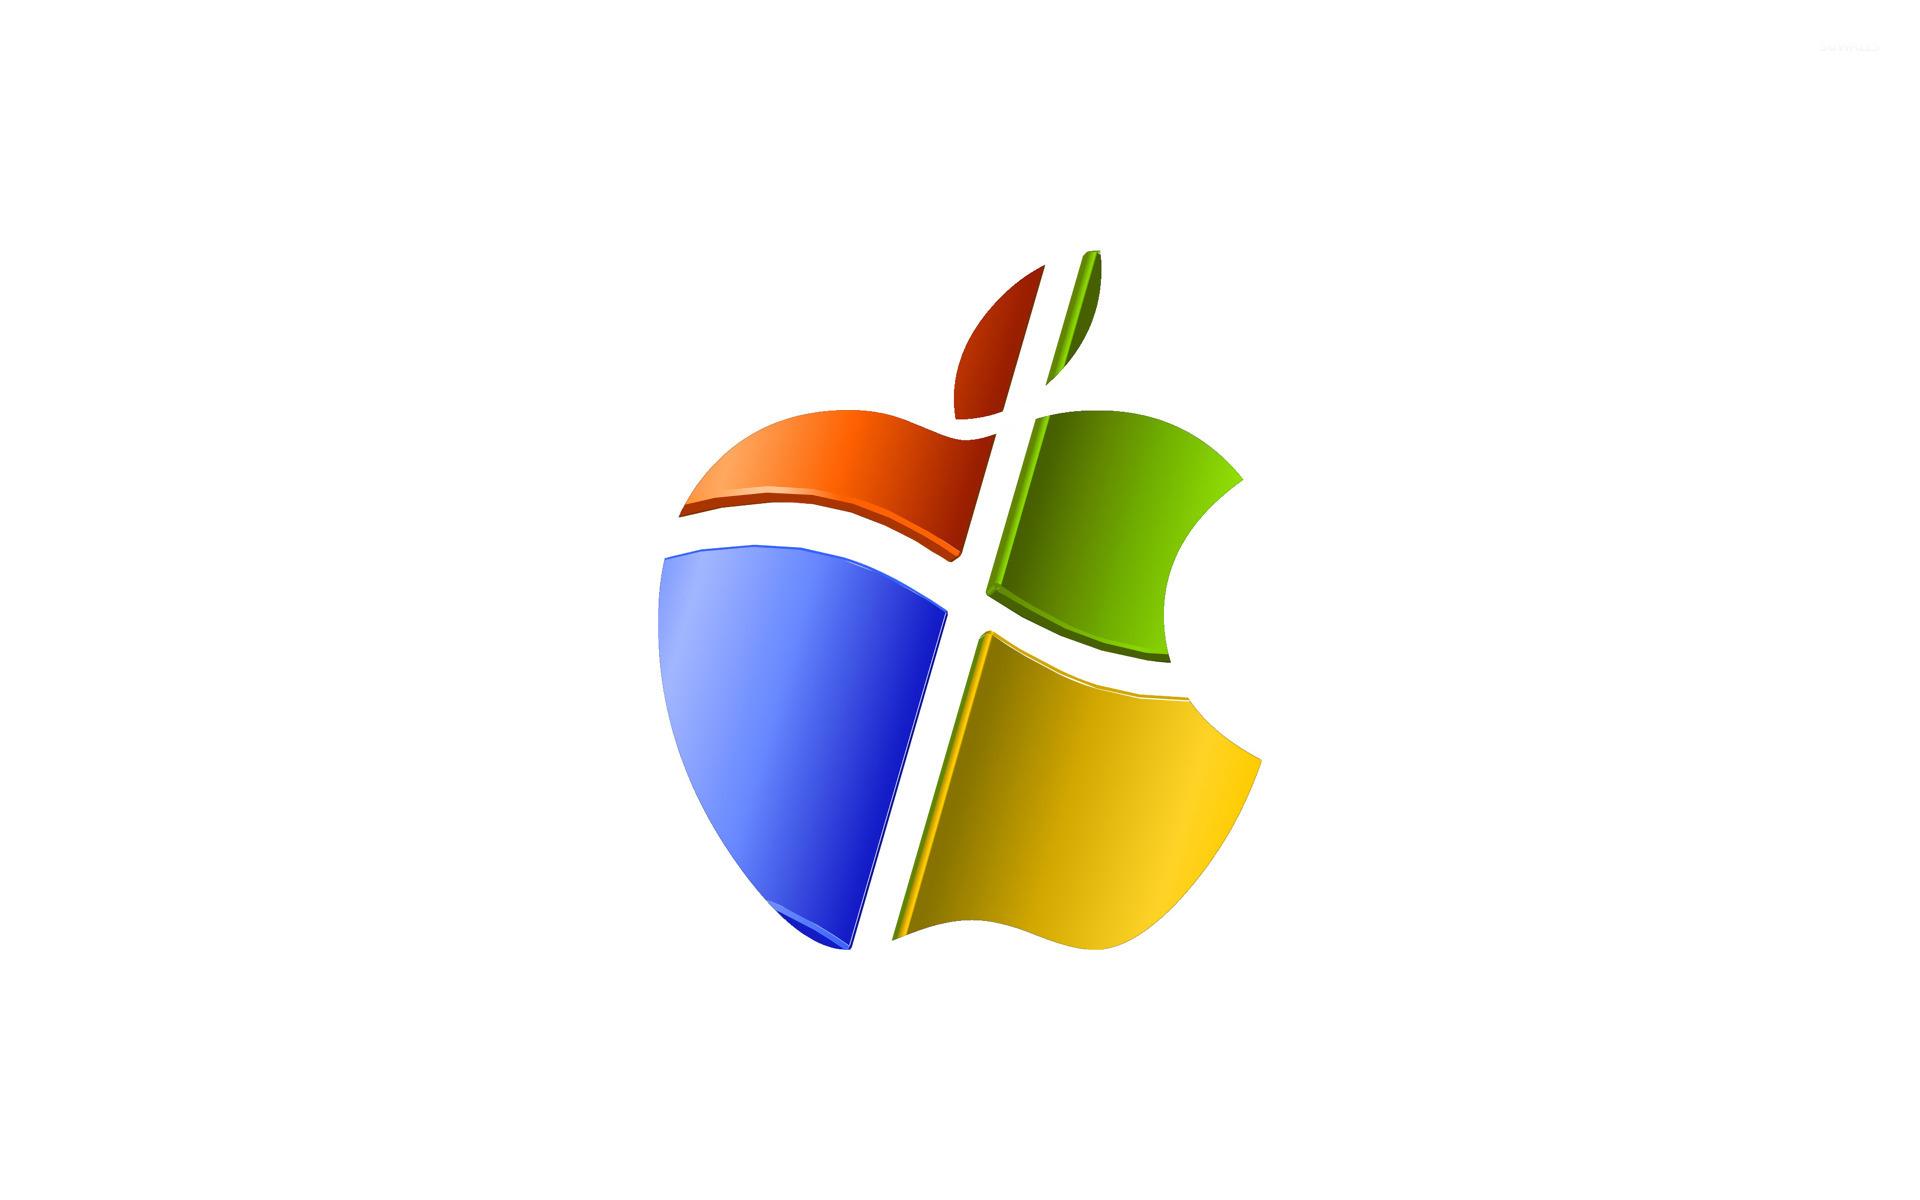 Apple Windows wallpaper - Computer wallpapers - #15290